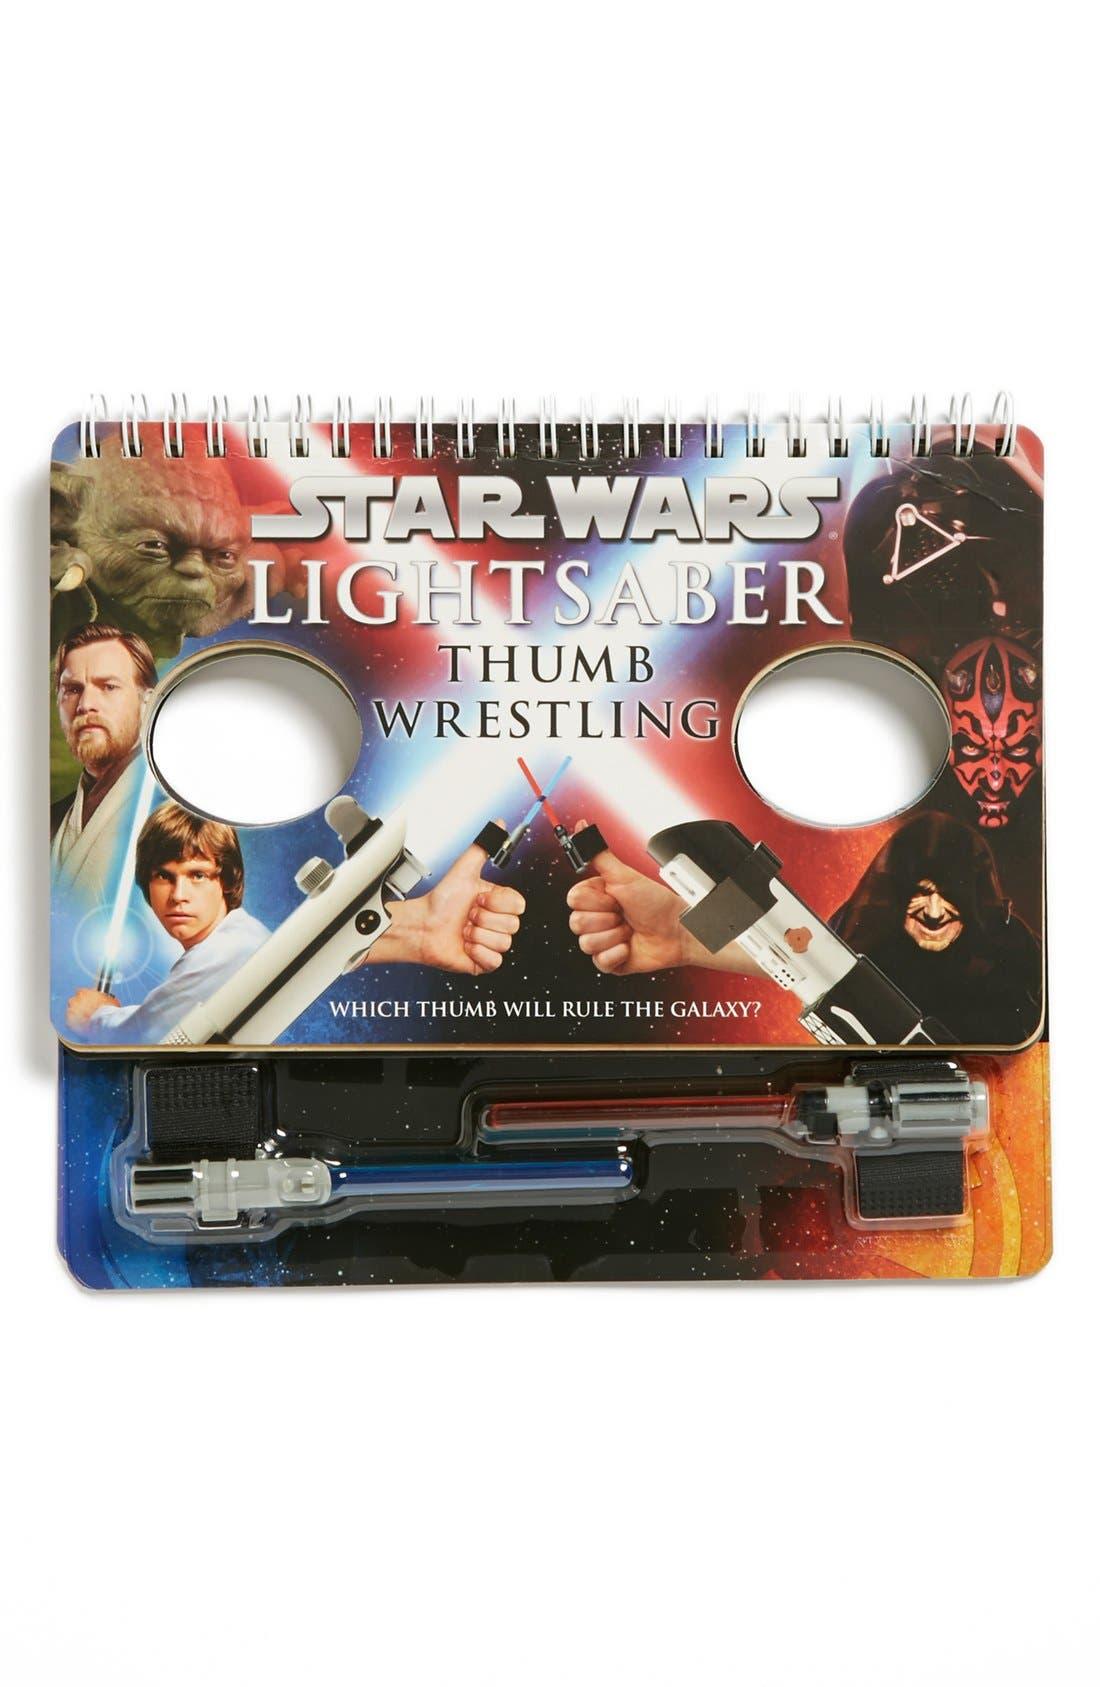 Main Image - 'Star Wars™ Lightsaber Thumb Wrestling' Book